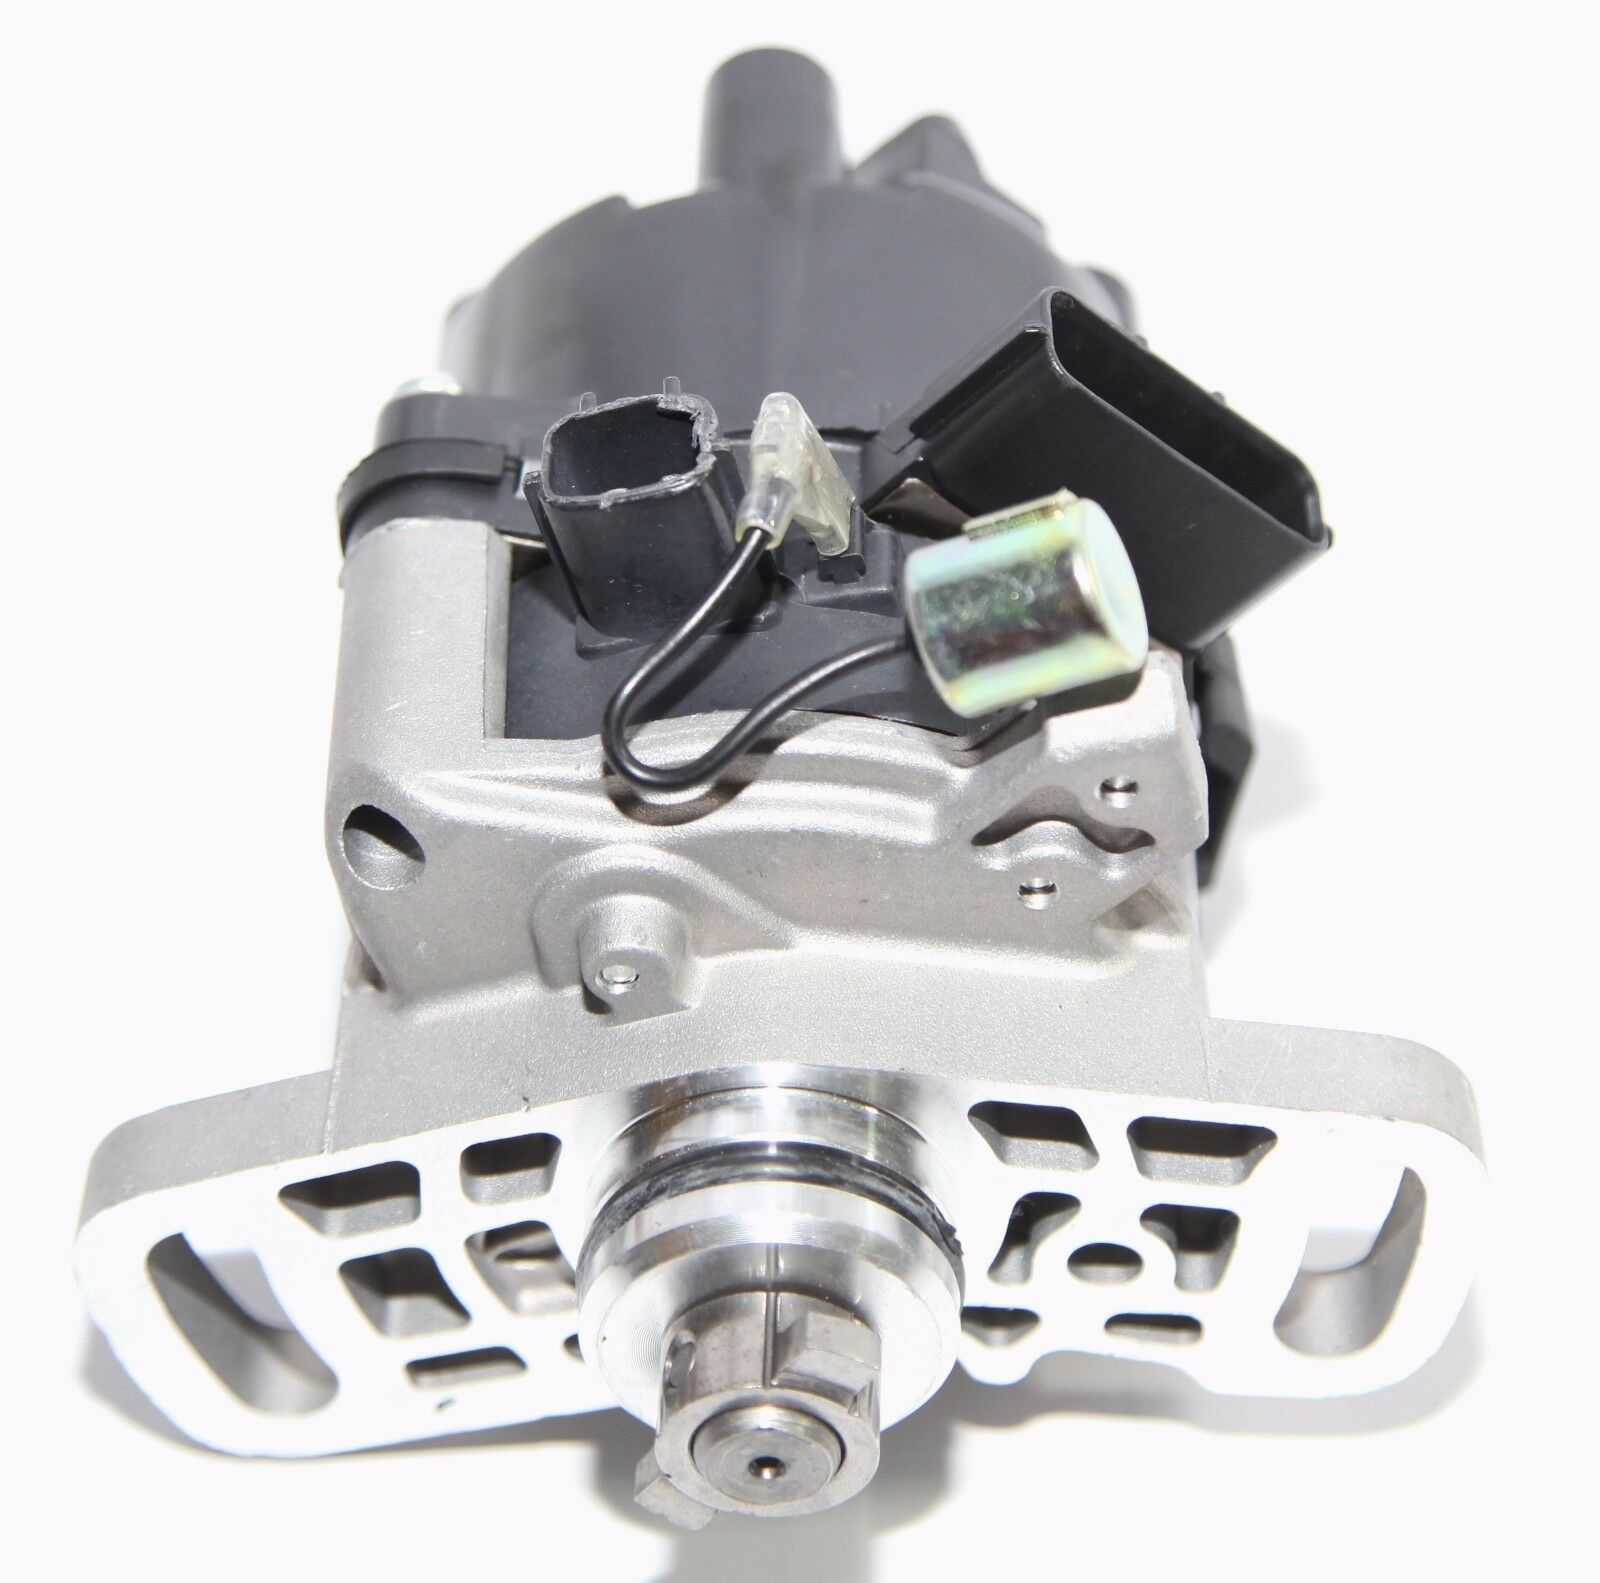 Ignition Distributor for Infiniti 94-96 1999 G20 2.0L 1998CC l4 GAS DOHC